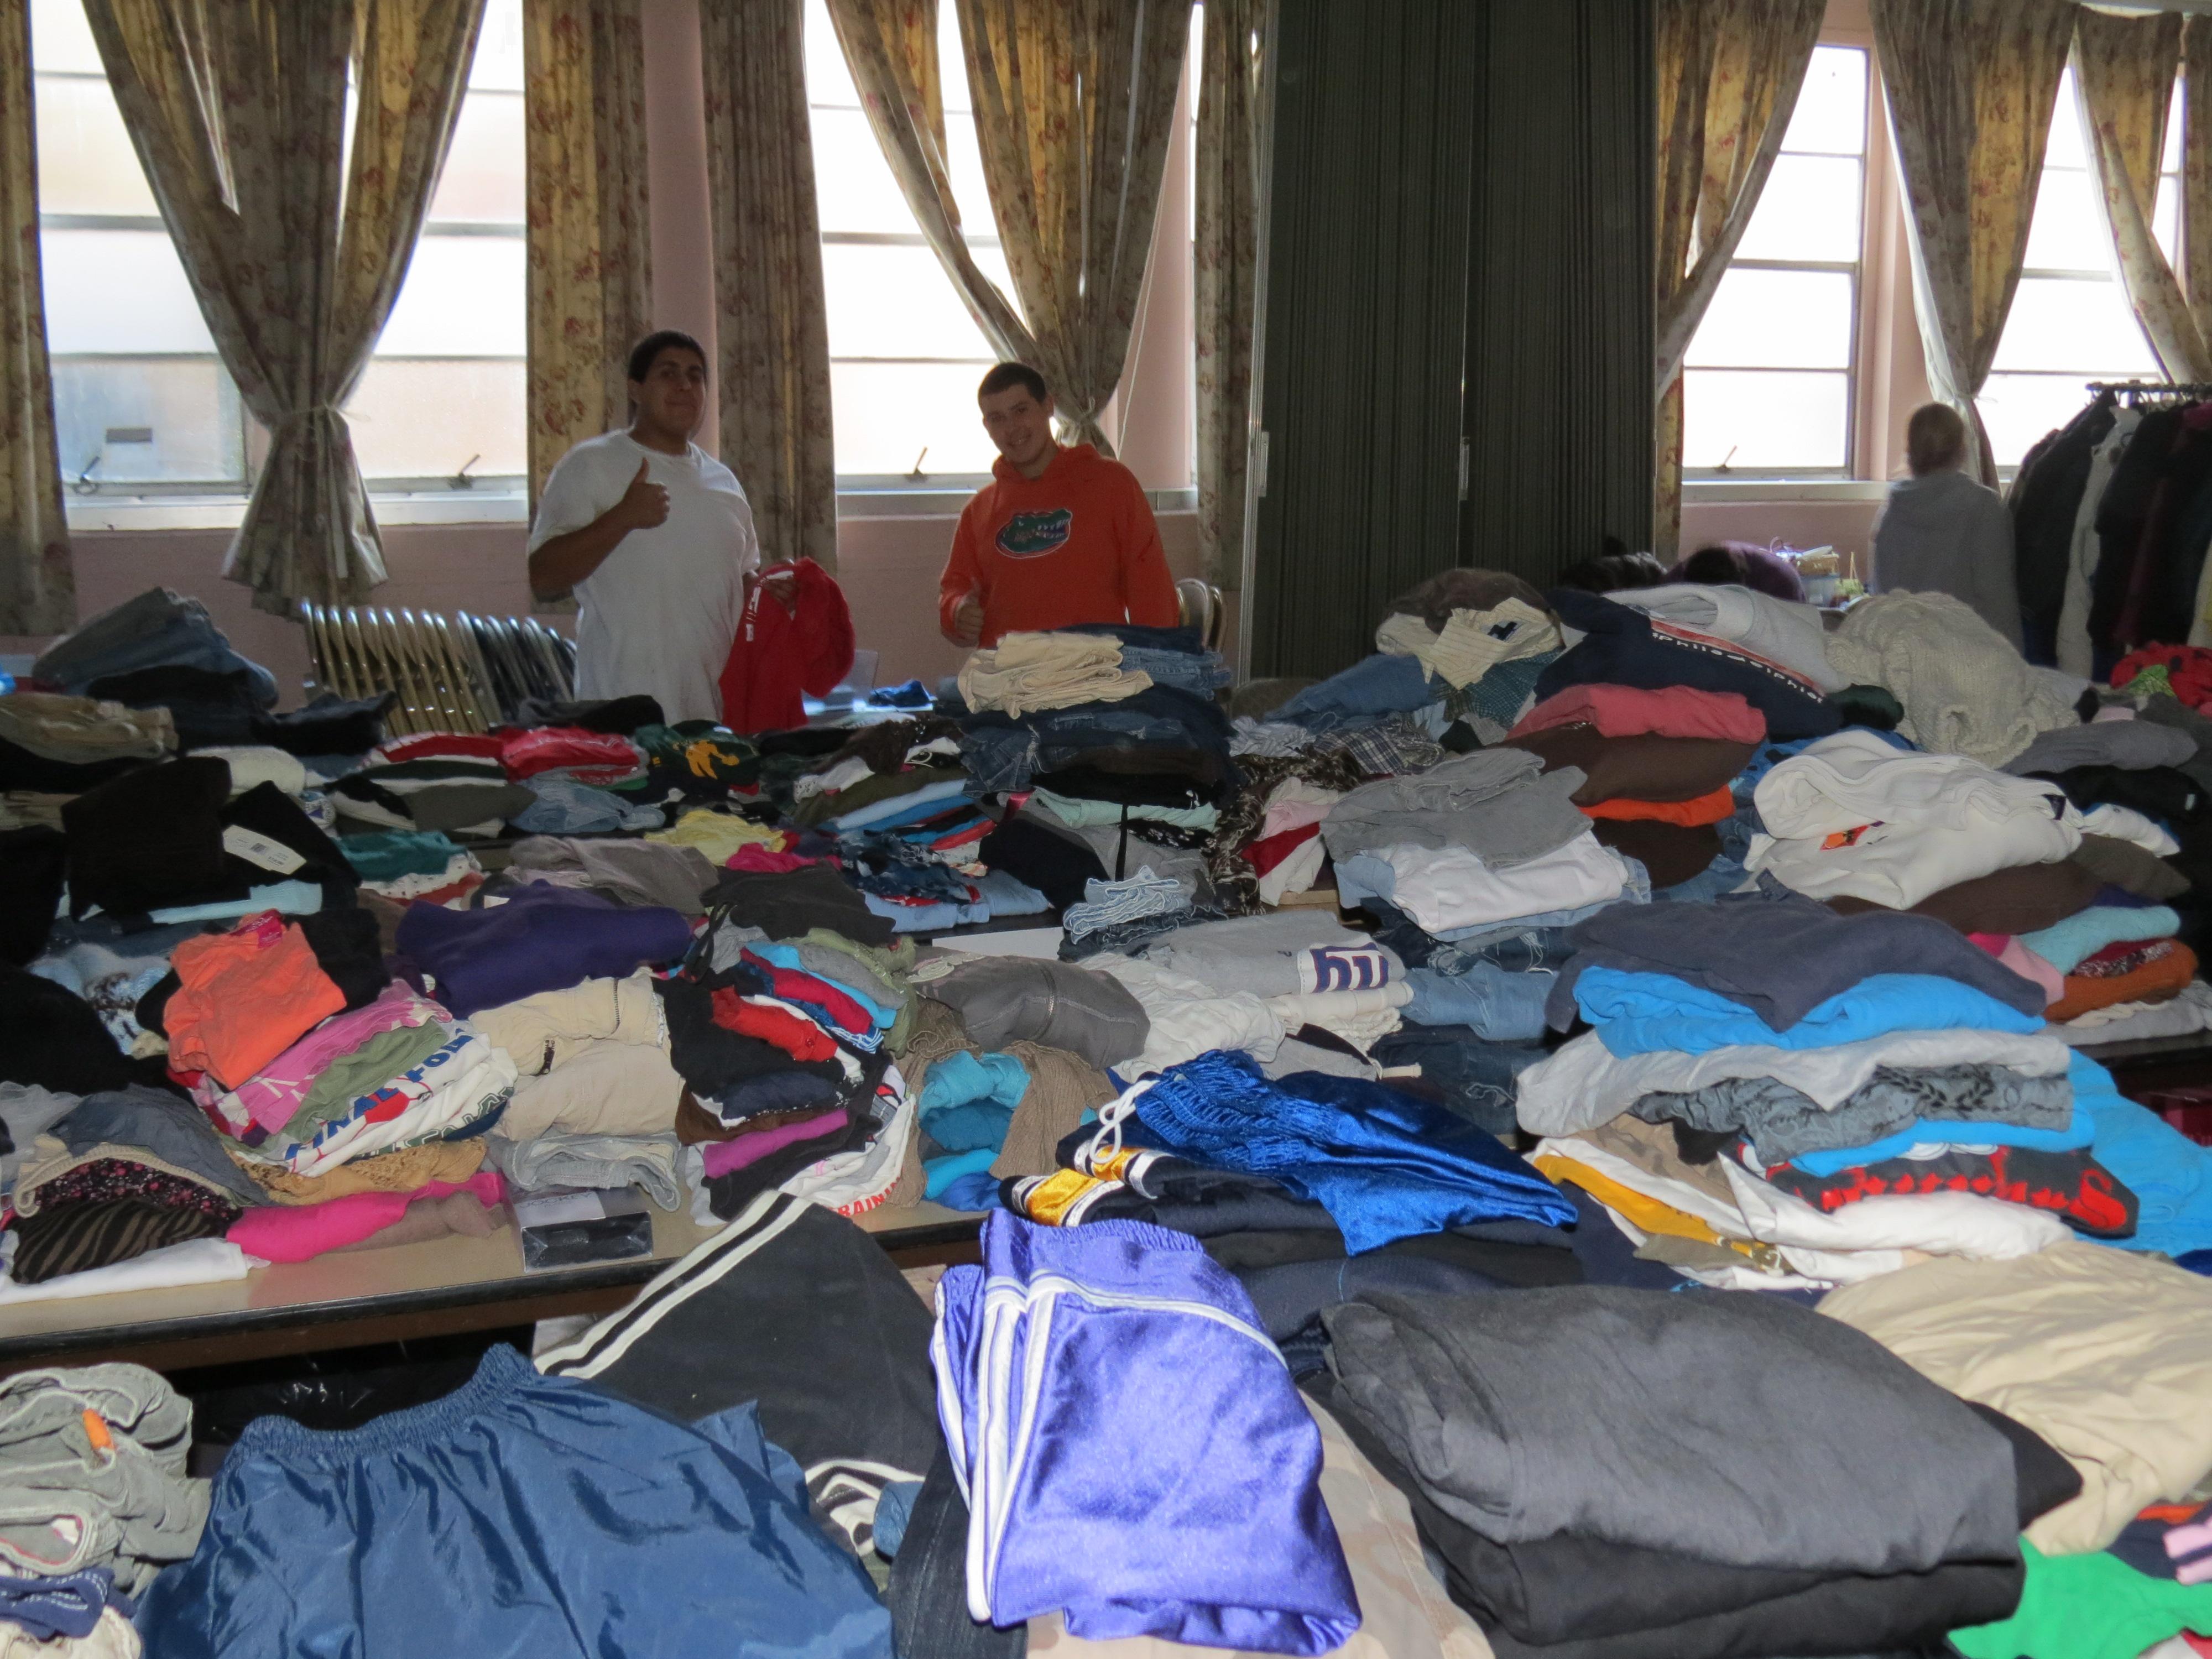 Teen volunteers sorting donated clothing in the dark basement of Grace UMC in Lindenhurst, N.Y.